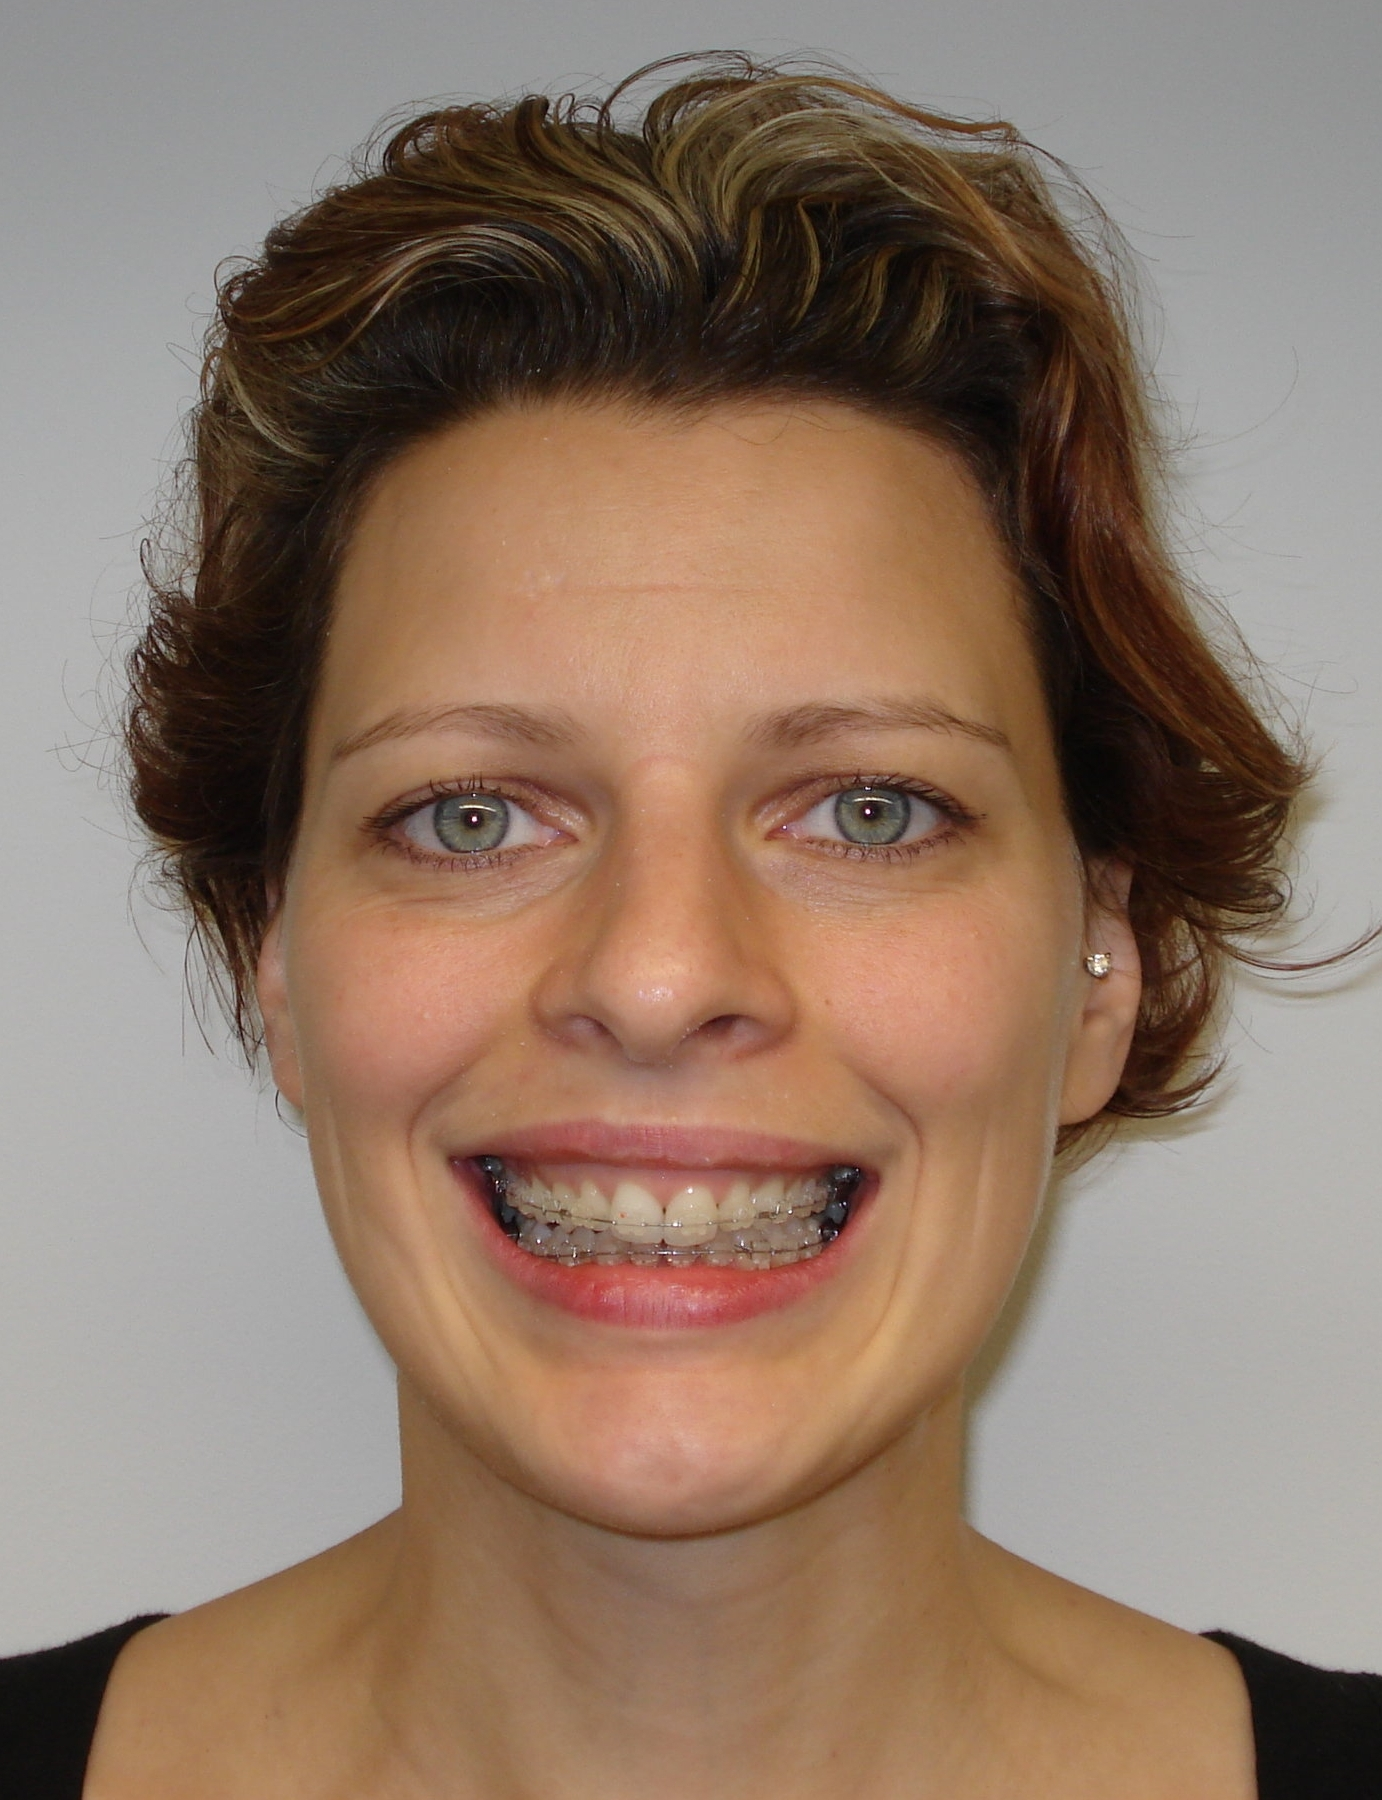 Clear braces after